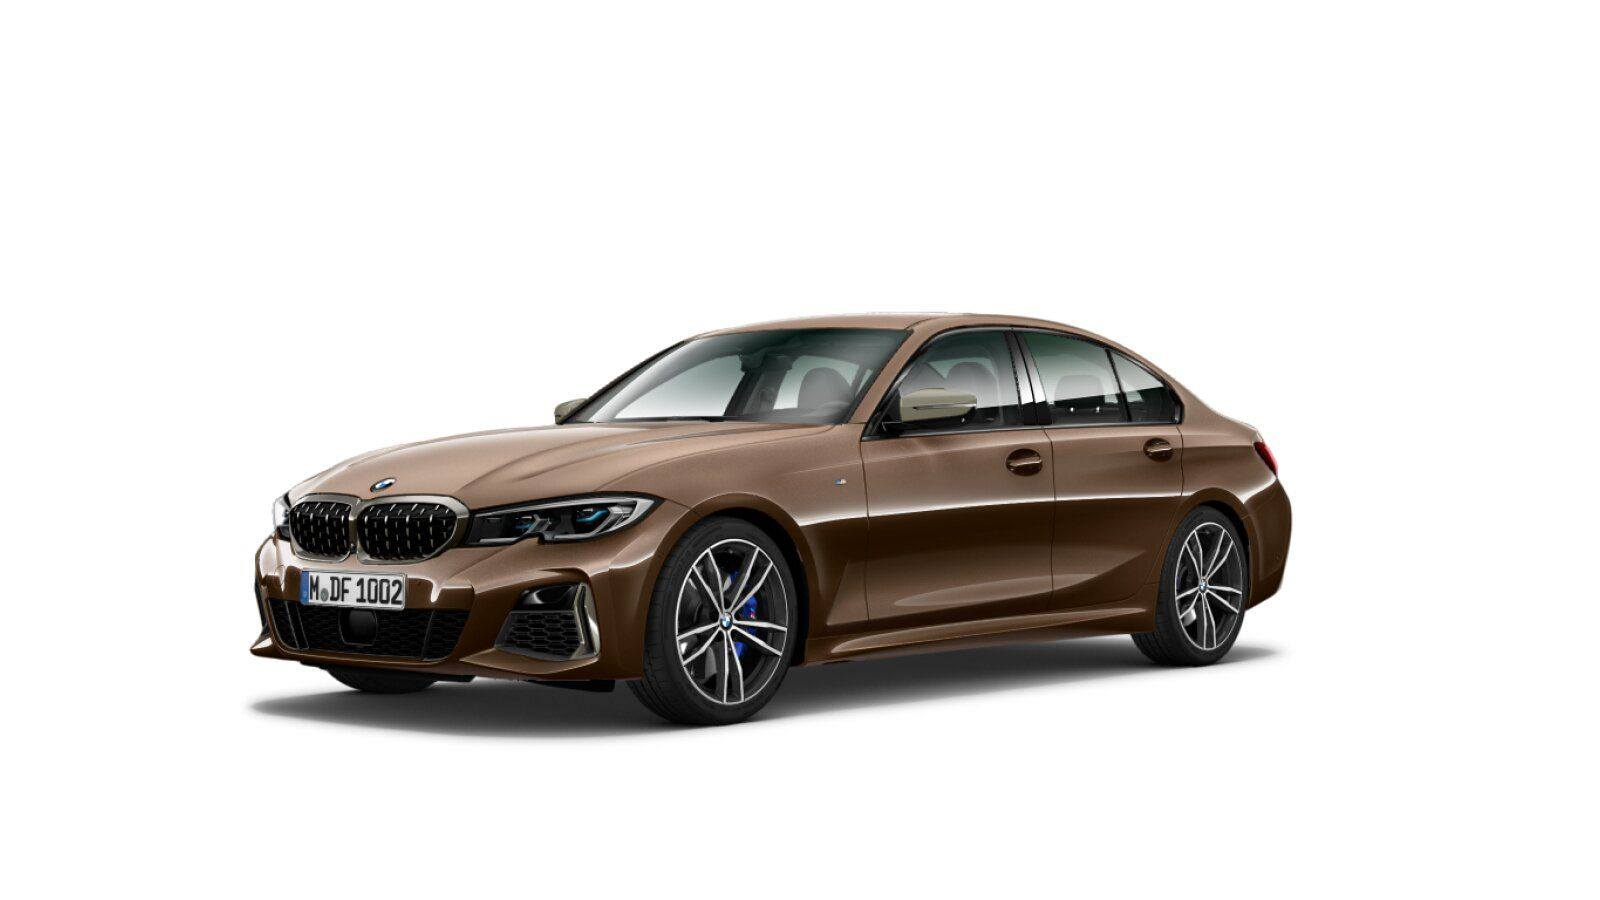 2019 BMW 3 Series G20 - Leaked